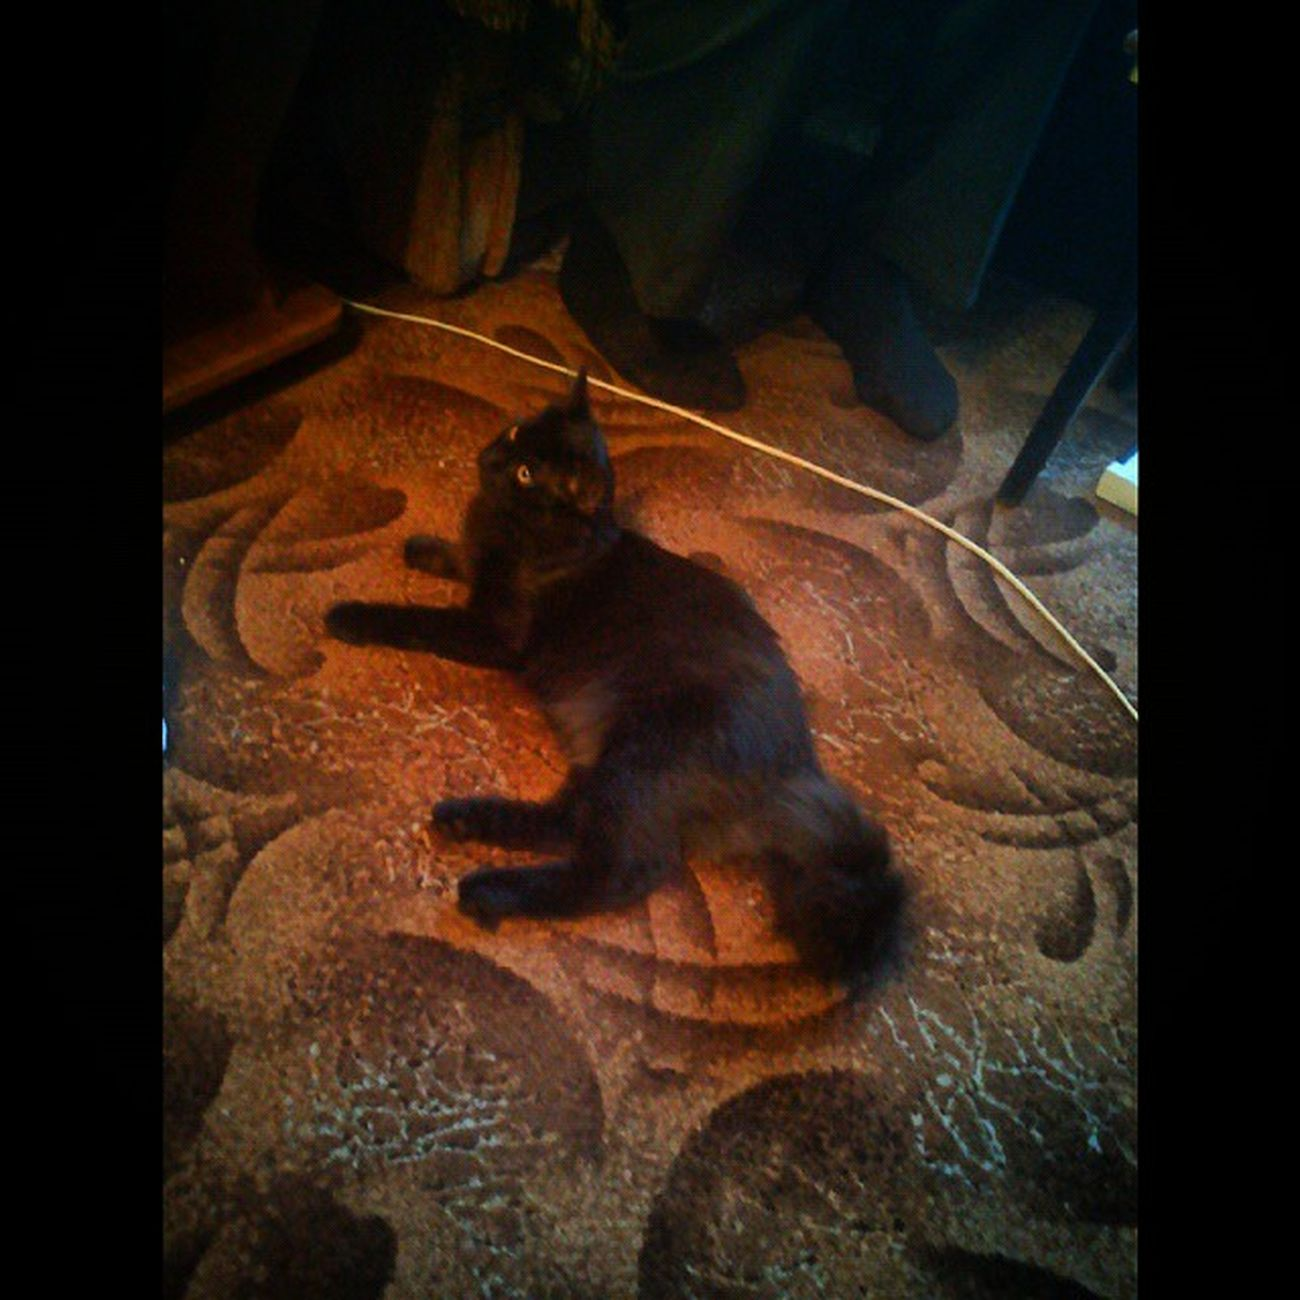 У хороших знакомых. Их красавец Лунтик. черныйкот лунтик КверхуБрюхом Черныш КотэНаркотэ Котэ ПитомецШпитомец ЛюблюКошек Luntik BlackCat kissekatt kitty Katty Catty KittyCat FriendCat SquareInstaPic